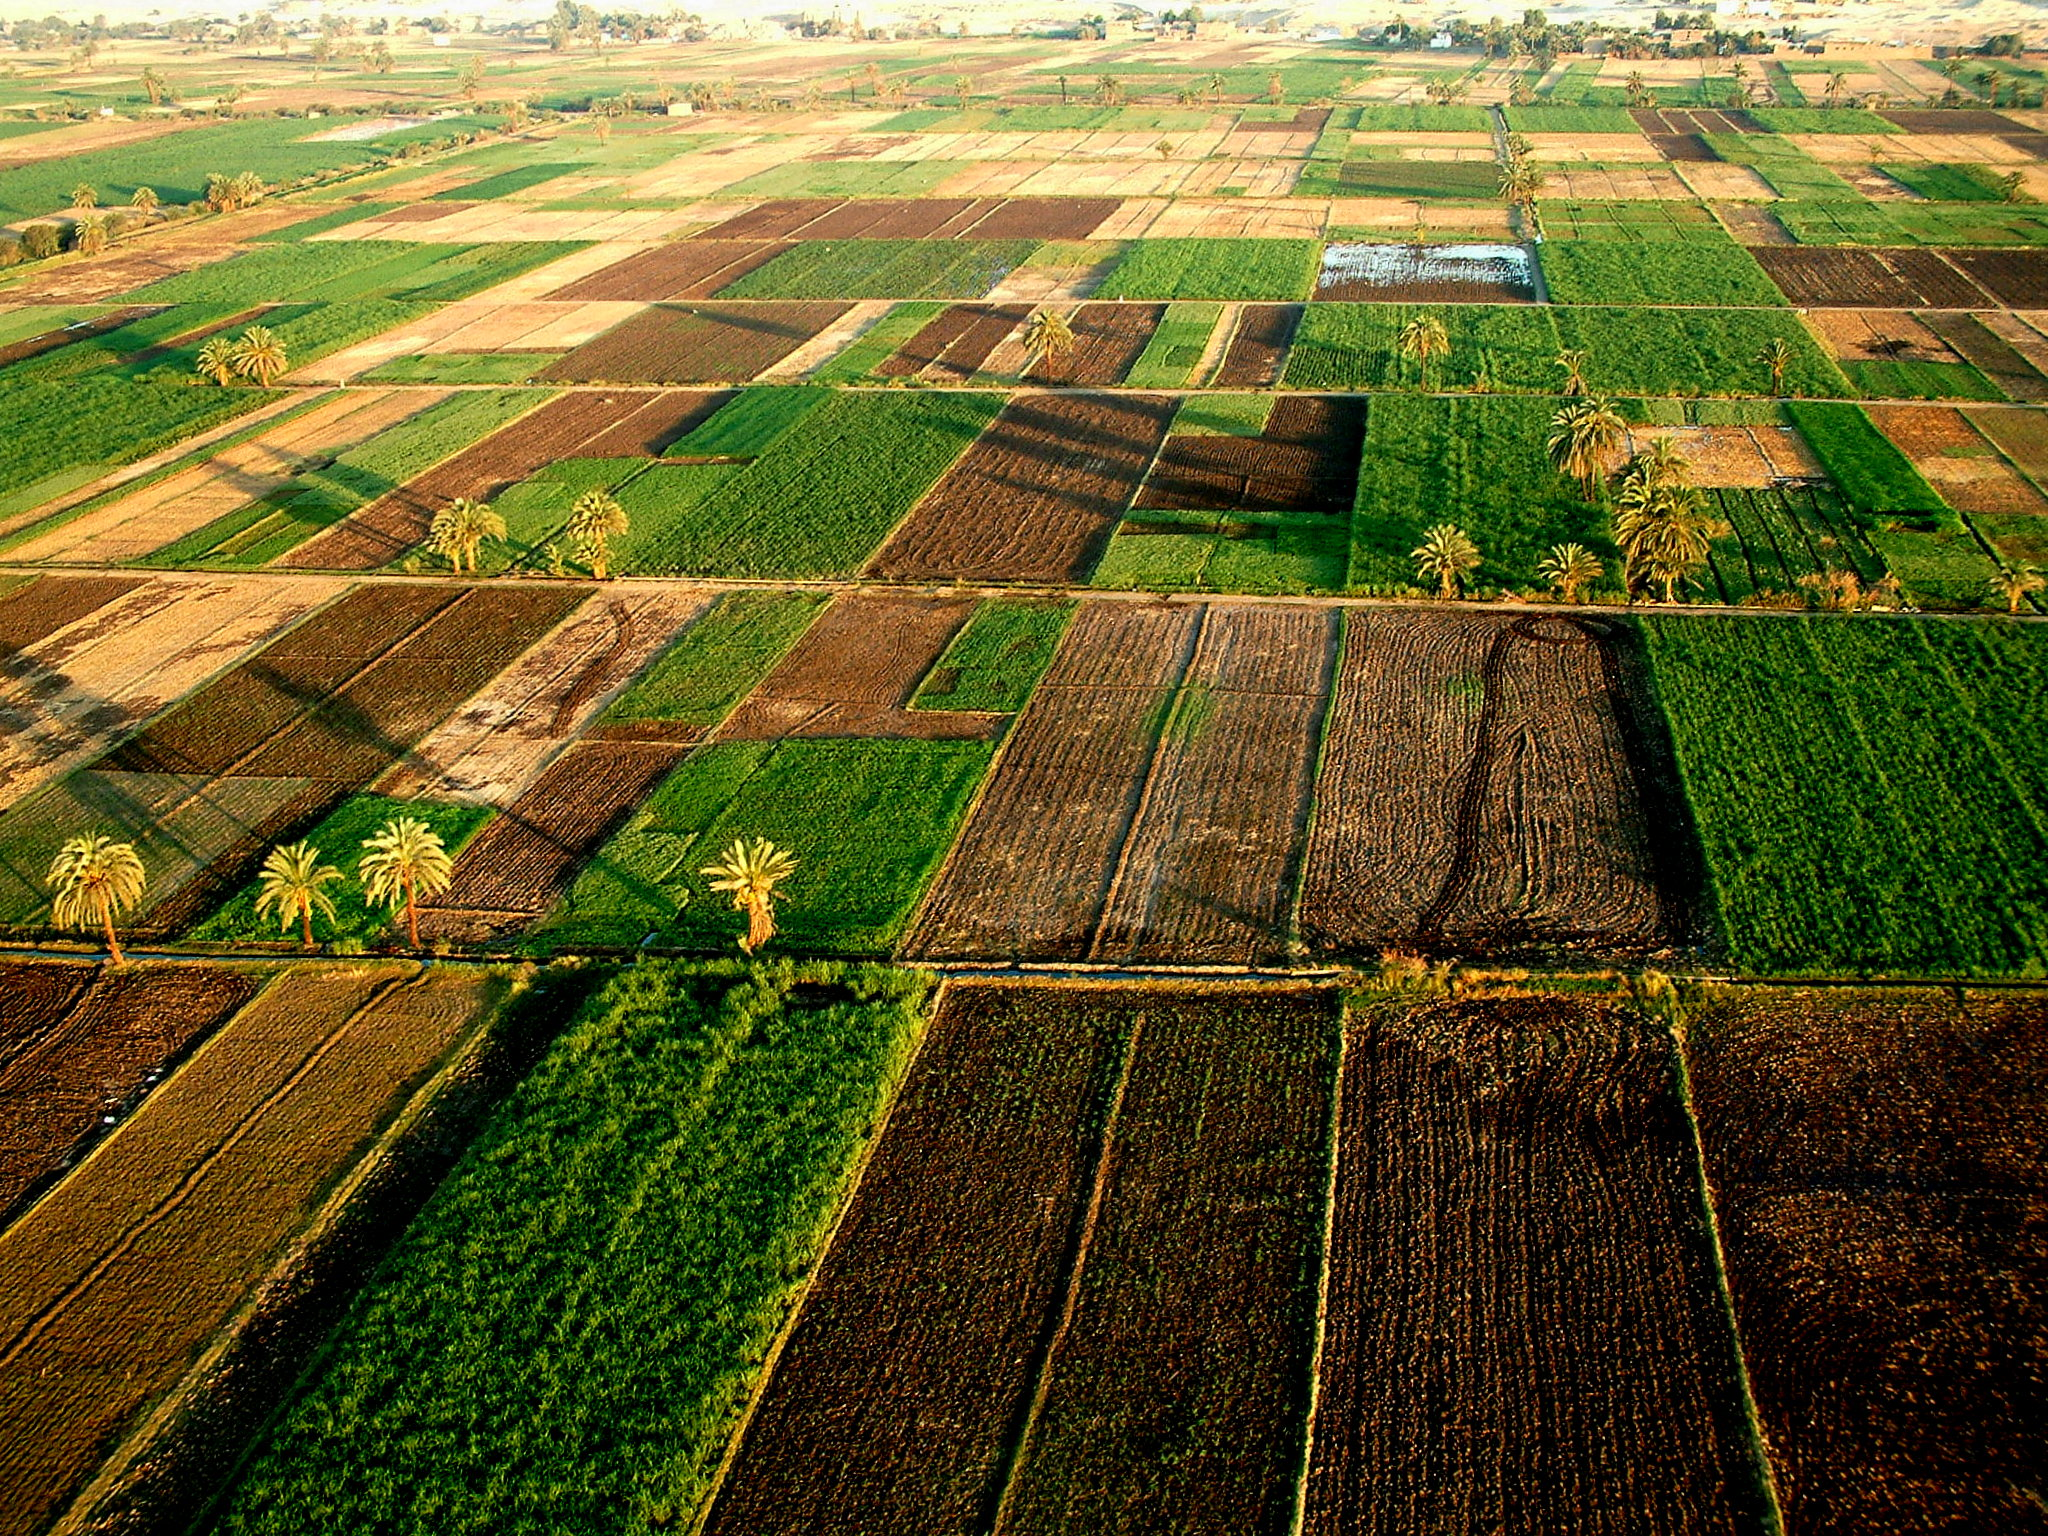 Farm land in Egypt